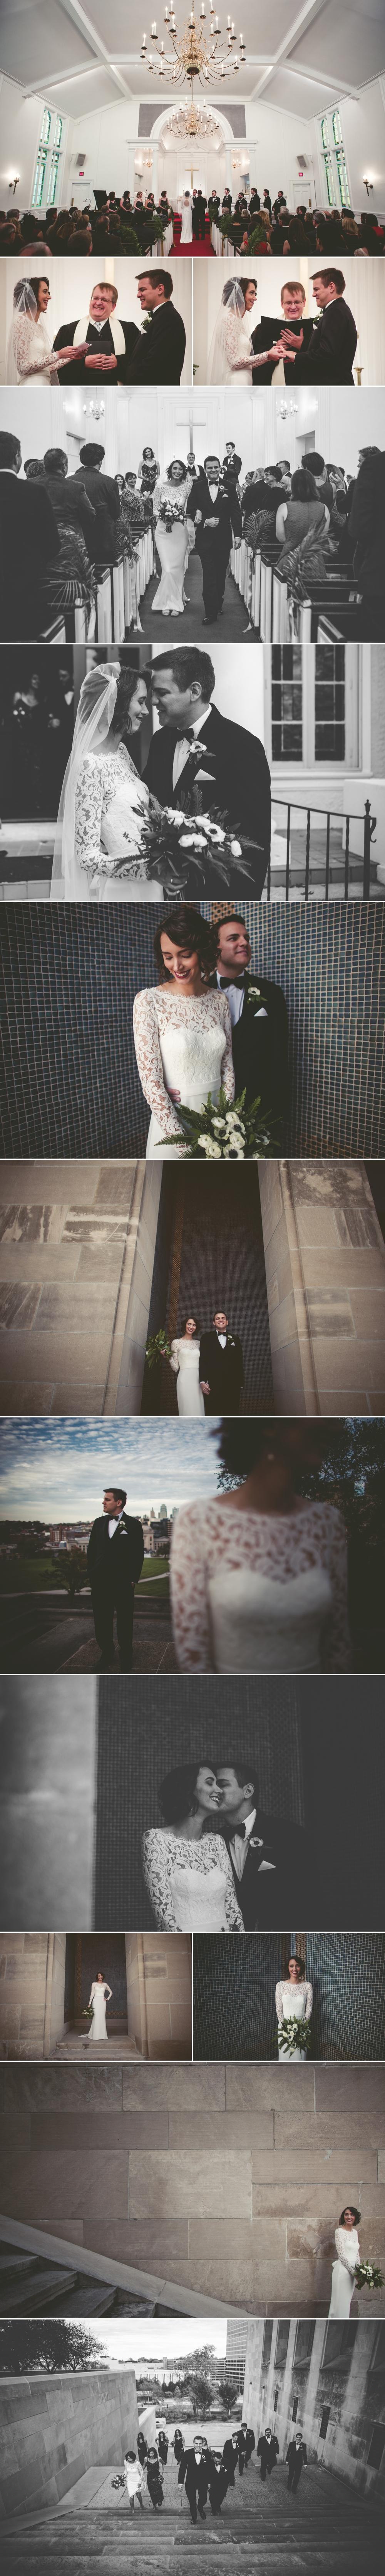 jason_domingues_photography_best_kansas_city_wedding_photographer_kc_weddings_berg0002